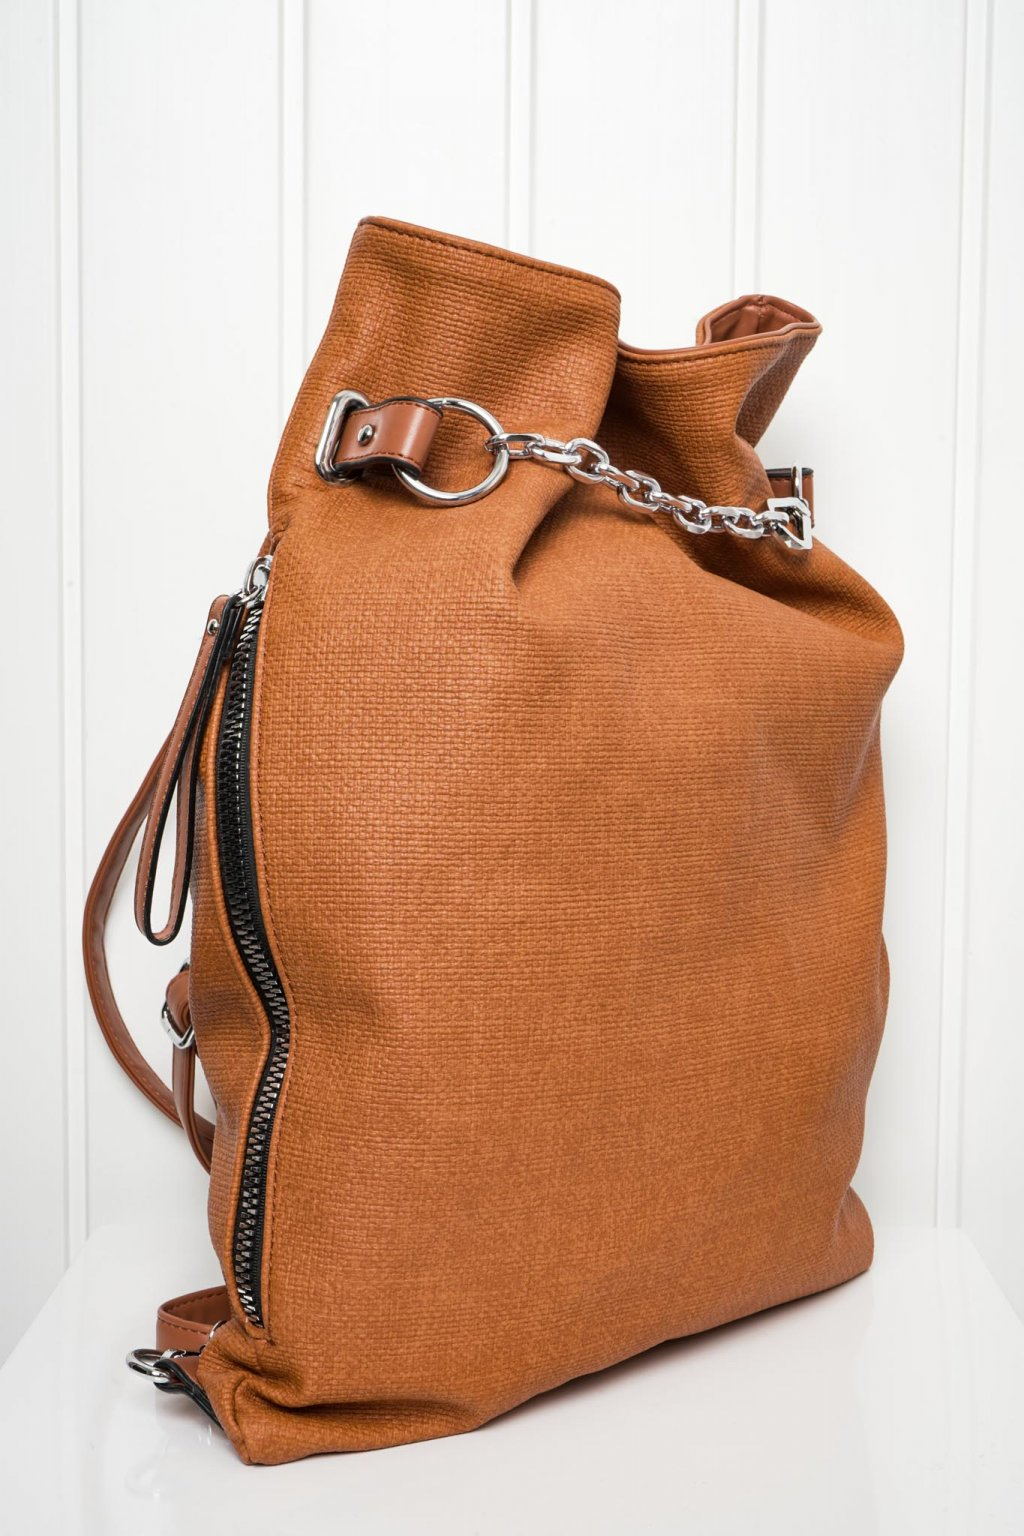 Kabelka, crossbody, ruksak, shopping bag, shopperka, 396